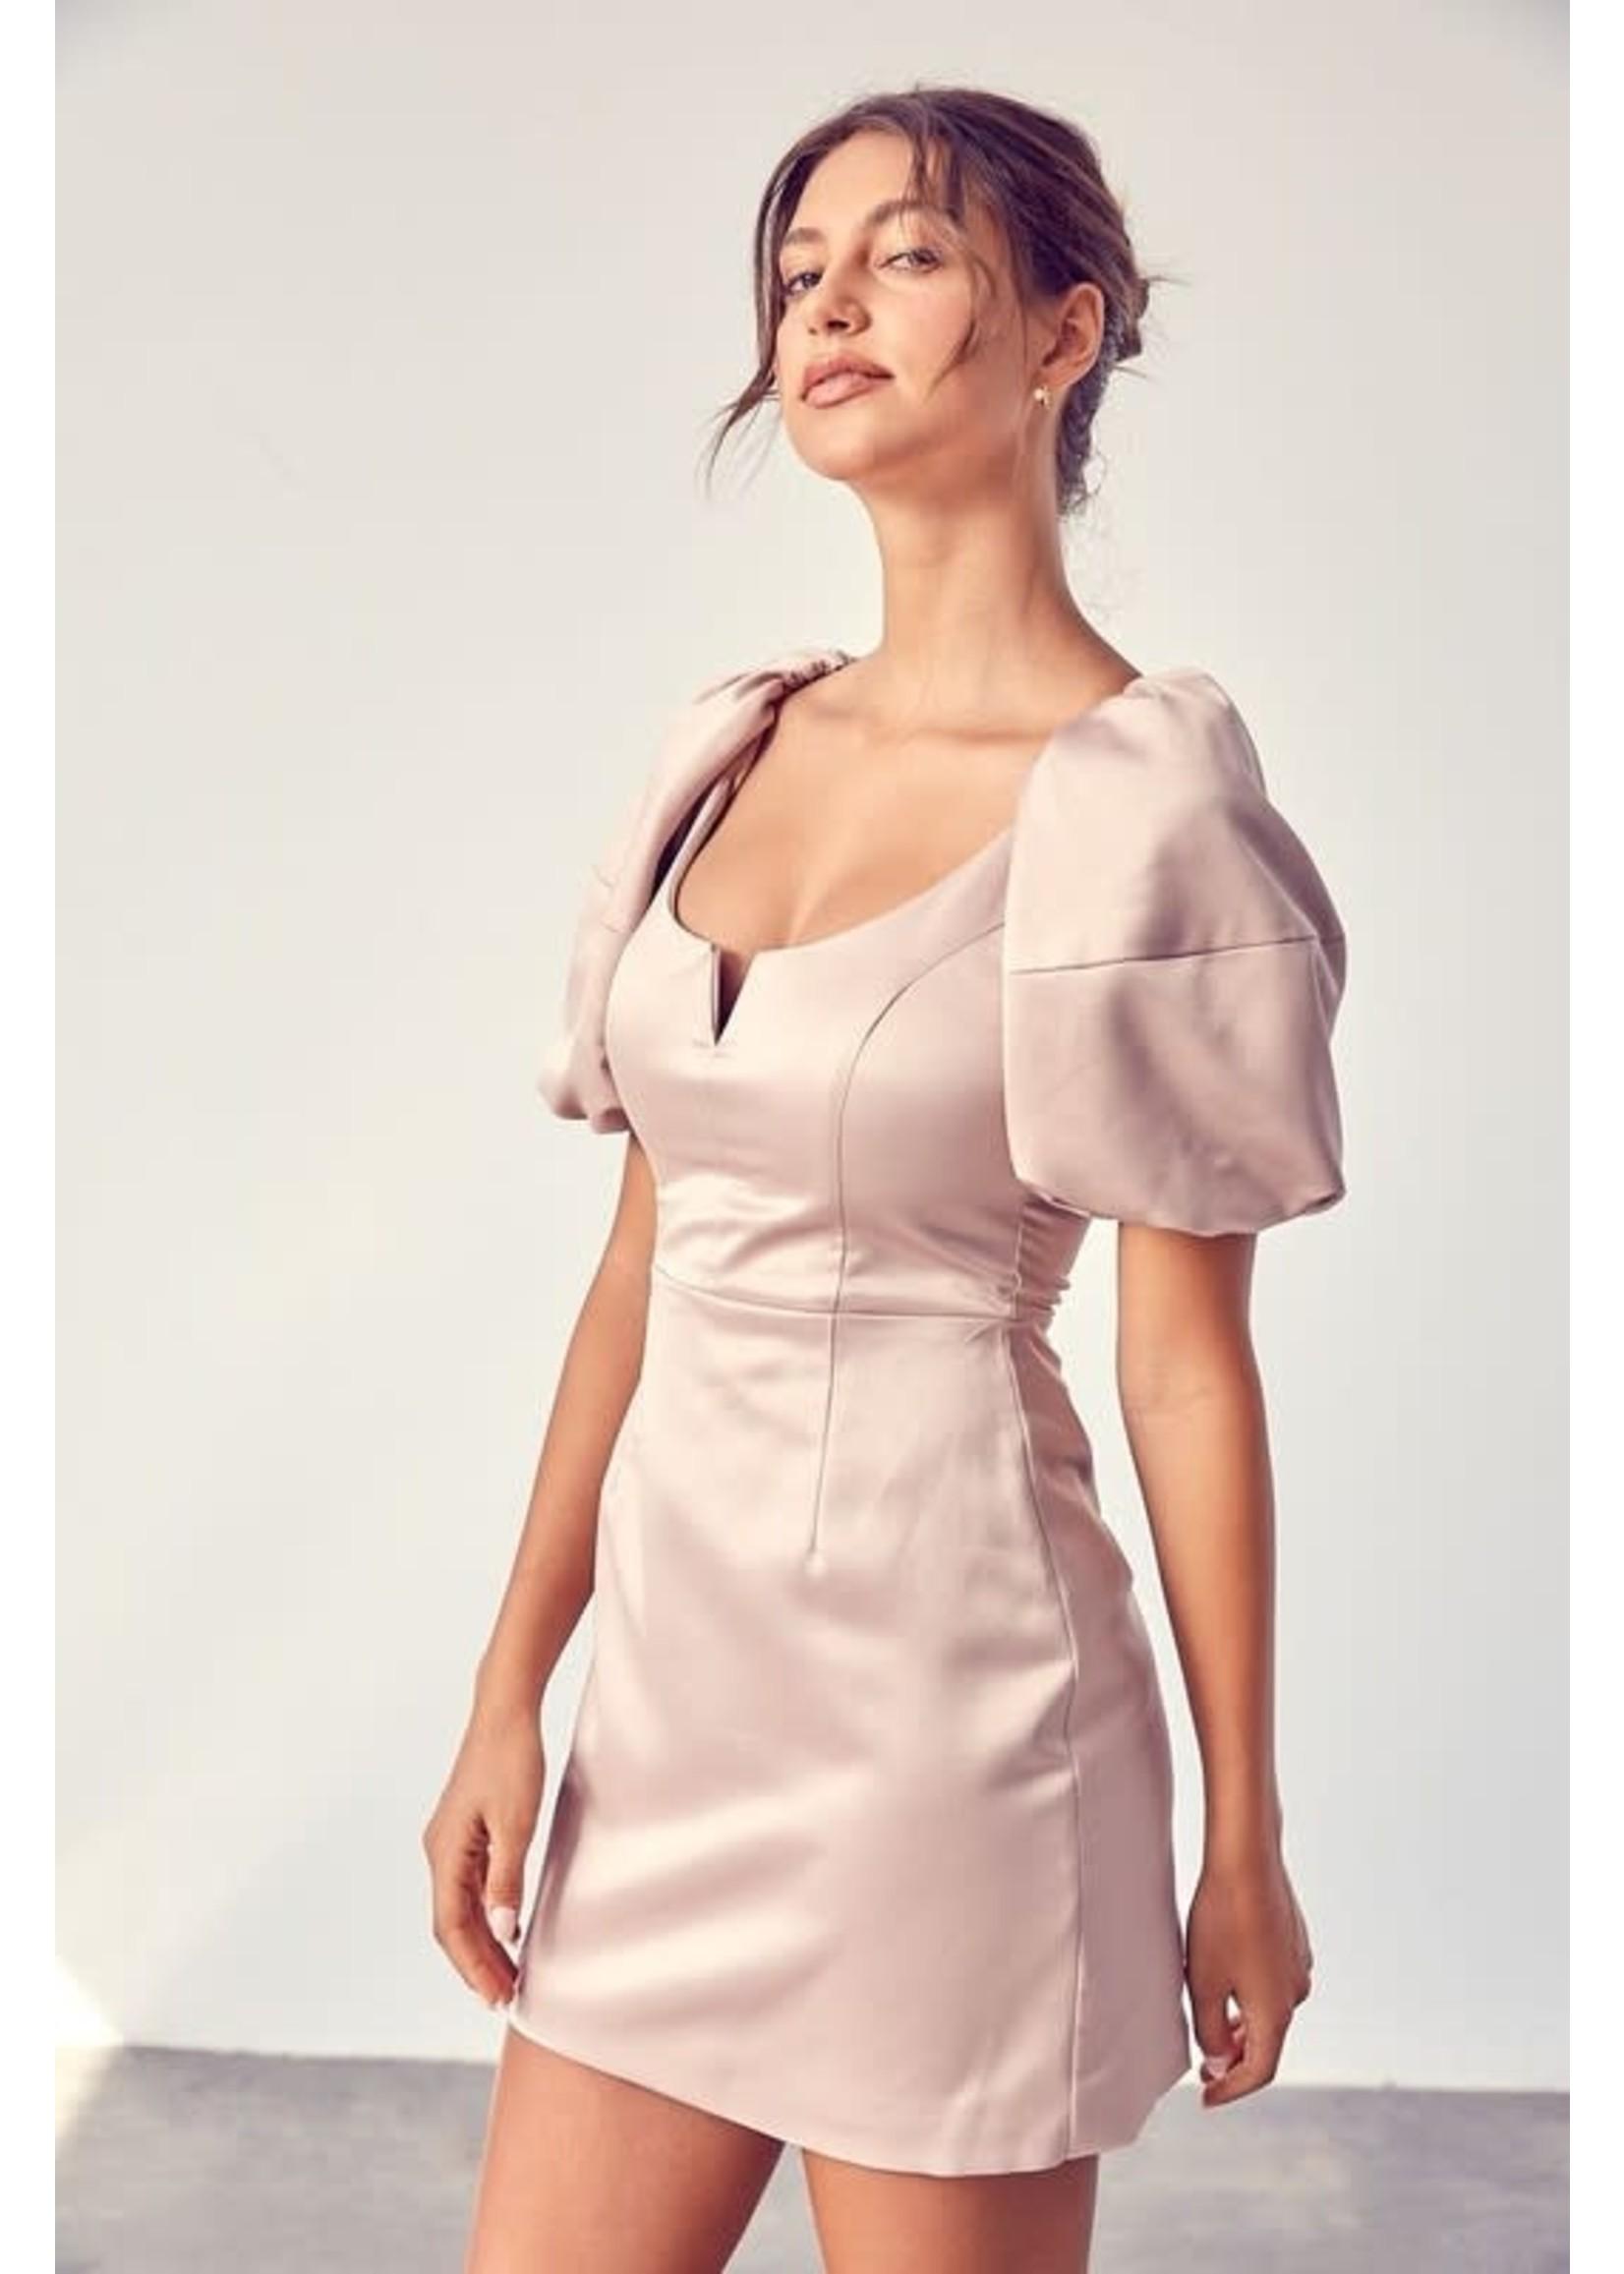 DO + BE 3/4th Puff Sleeve Mini Dress - GY1027